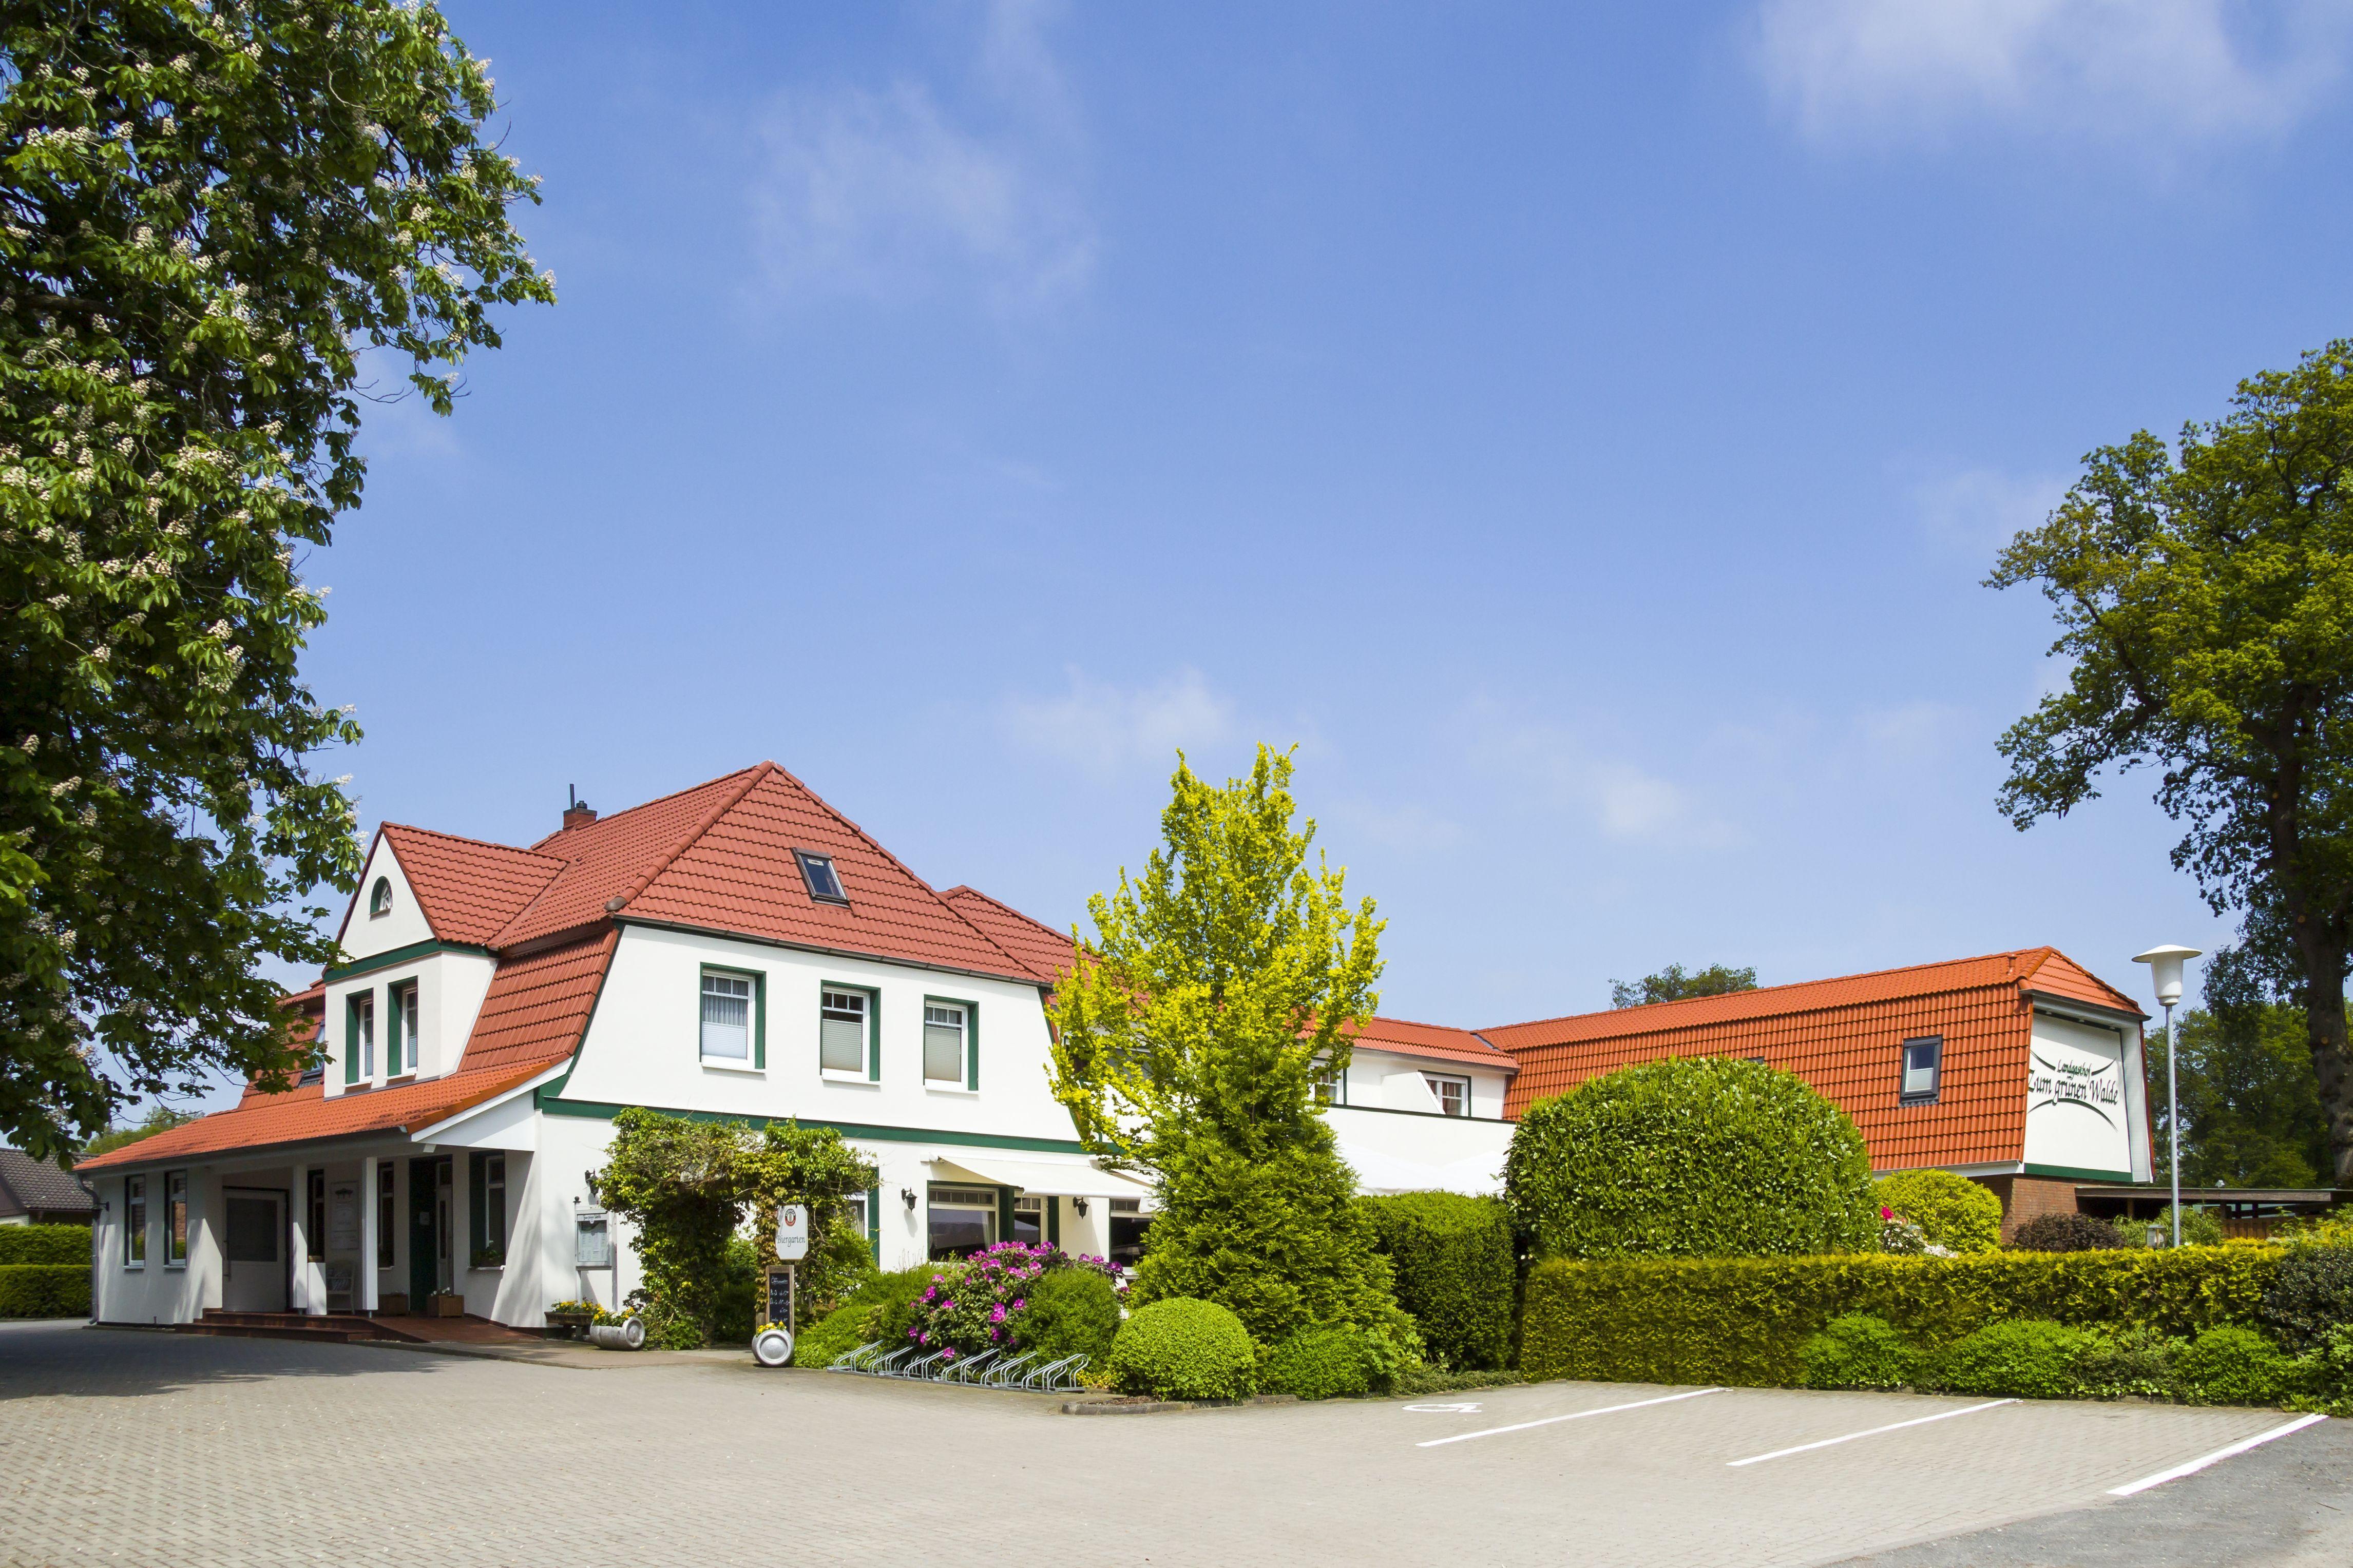 Hotel Zum grünen Walde Nordholz Doppelzimmer